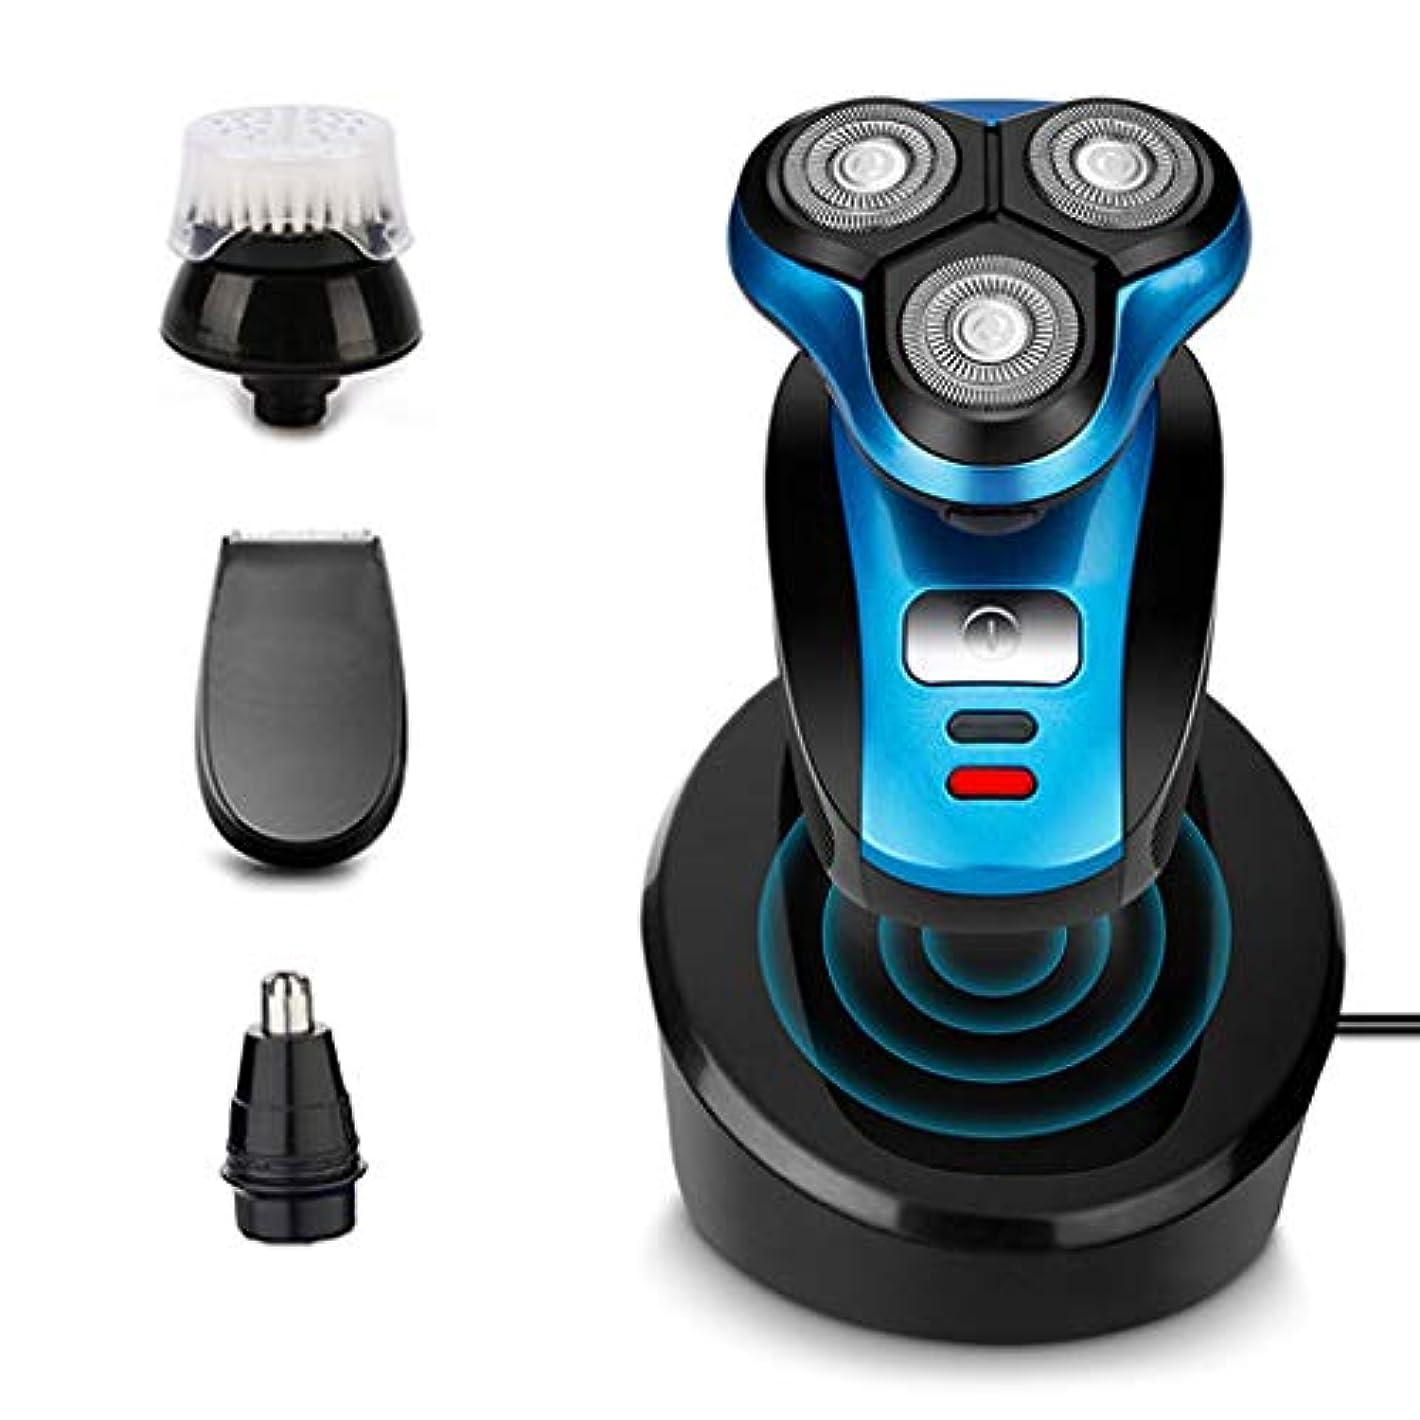 YHSUNN USBワイヤレス充電電気シェーバー男性用フローティング3ブレードヘッド電気シェービングマシン充電式かみそりフェイスケアツール